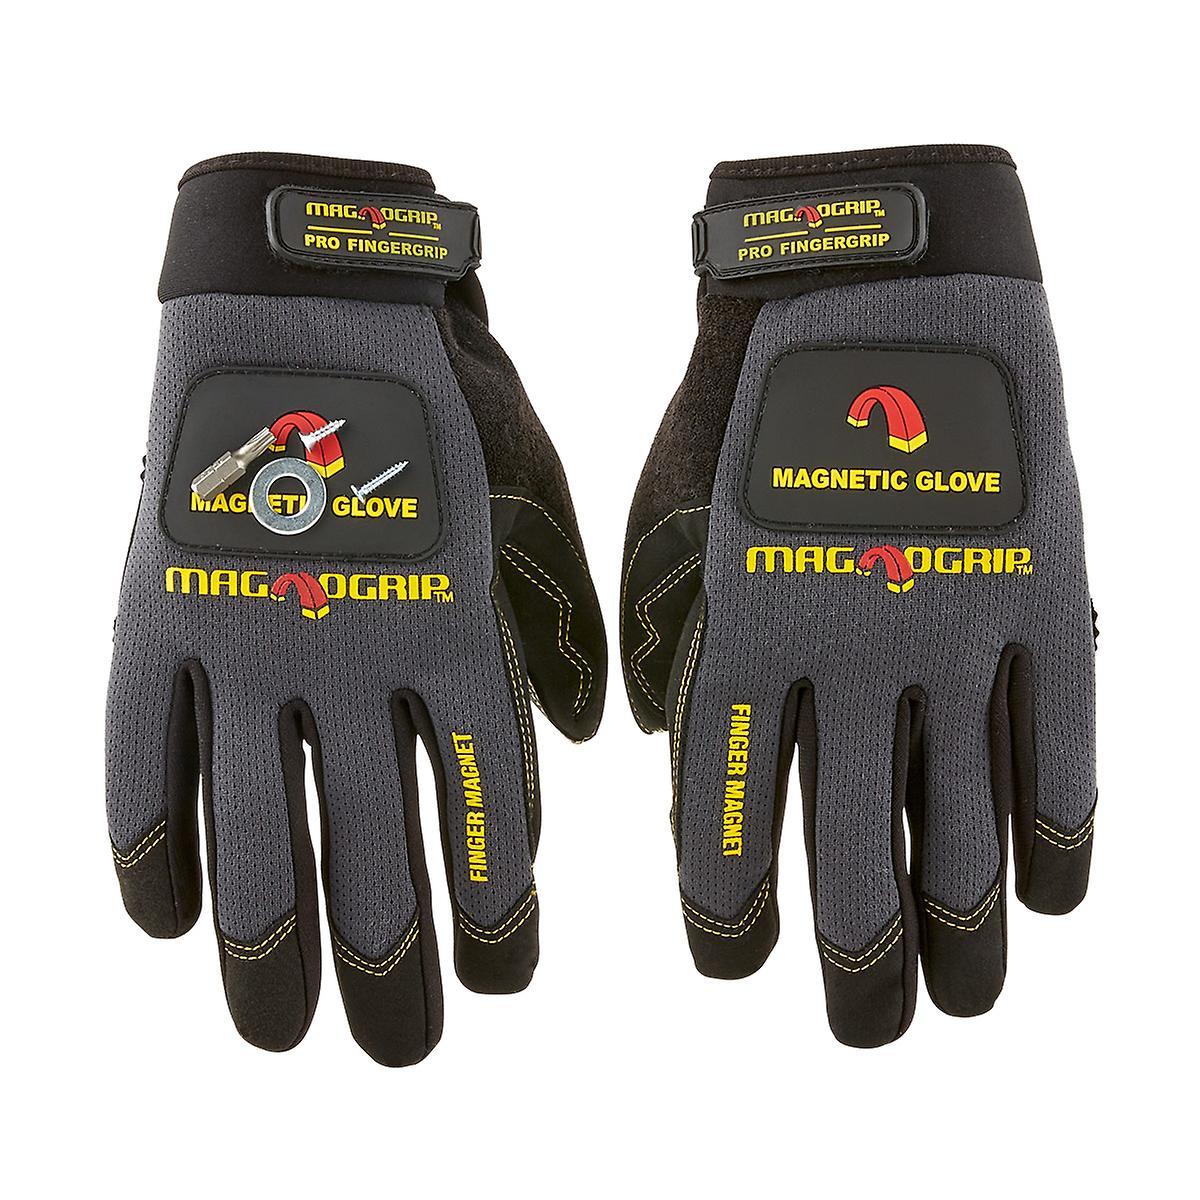 FingerGrip Magnetic Glove